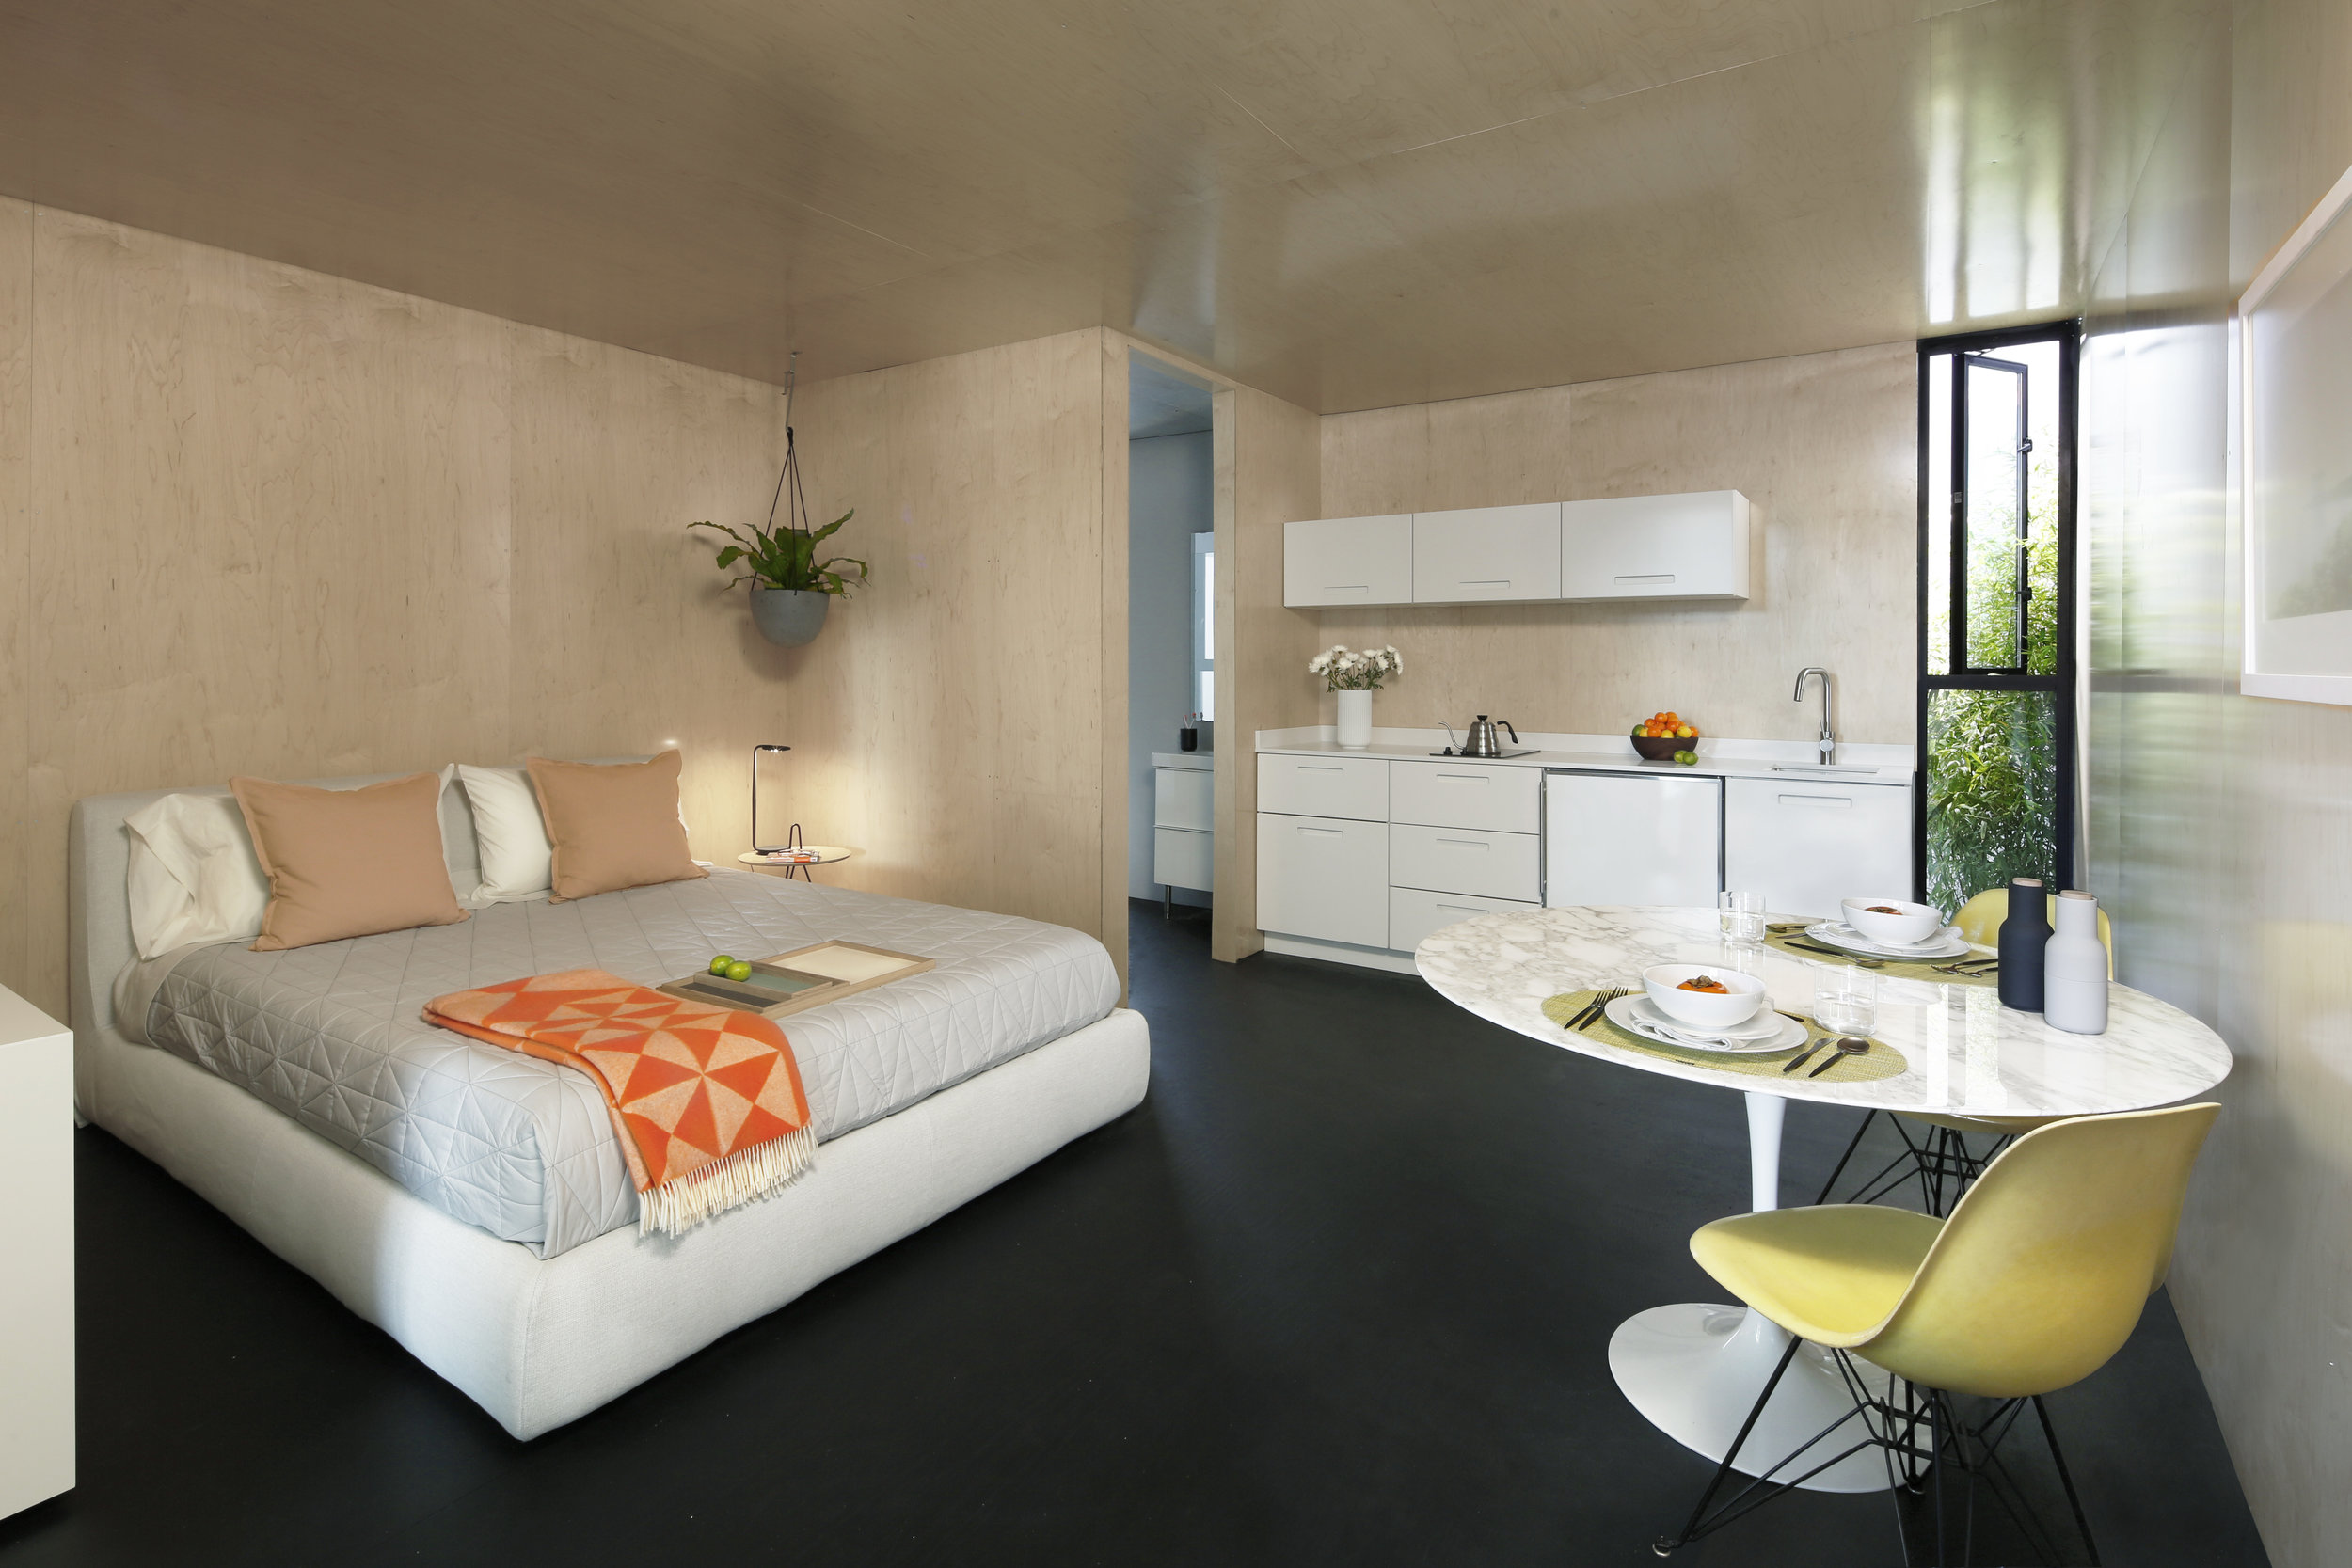 The Plus Hus - Interior Angled Bedroom.jpg